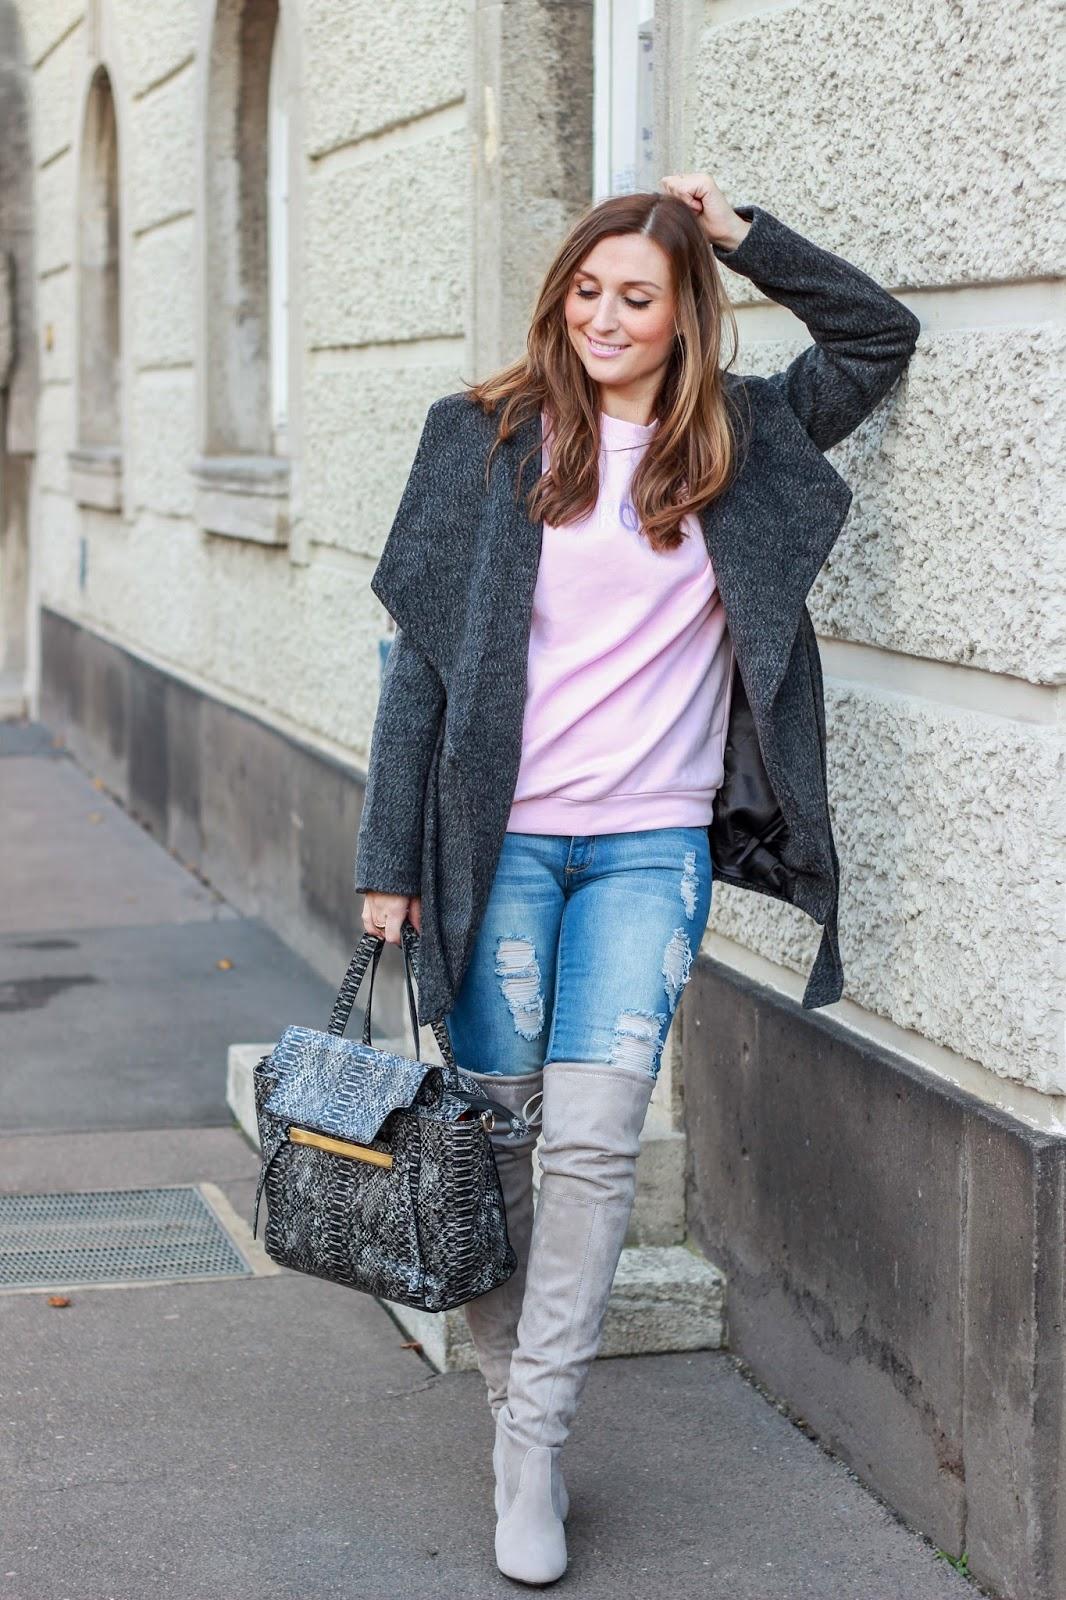 Jessica Buurman Fashionstylebyjohanna Fashionblog